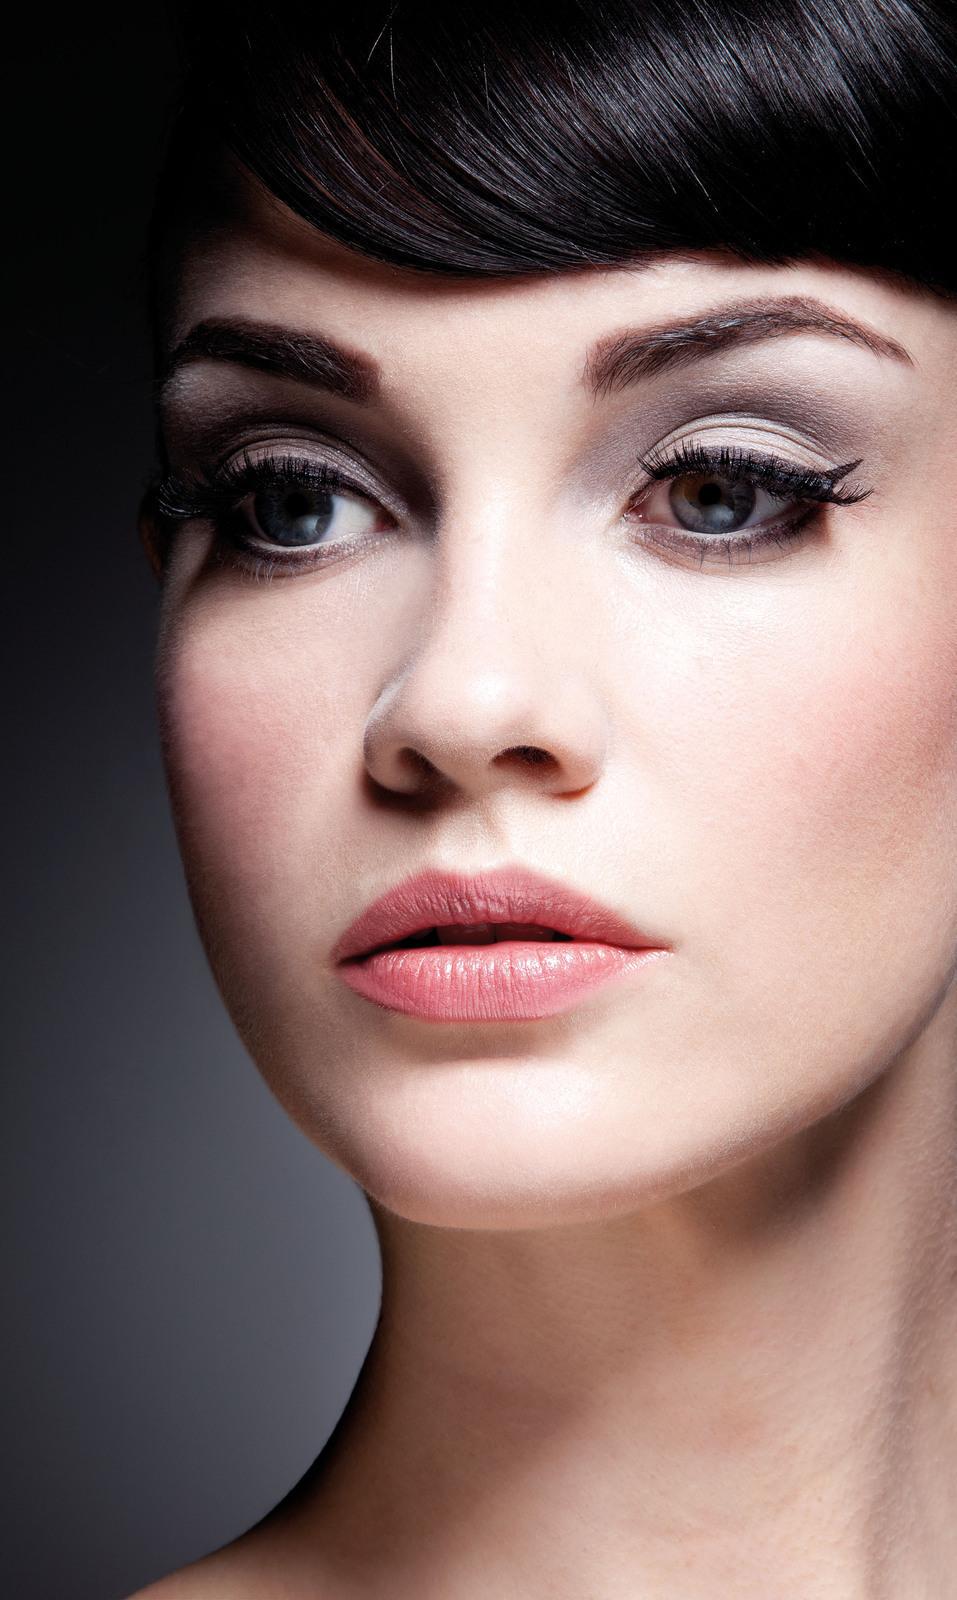 Audrey Hepburn Extract From Jemma Kidd Make Up Secrets By Jemma